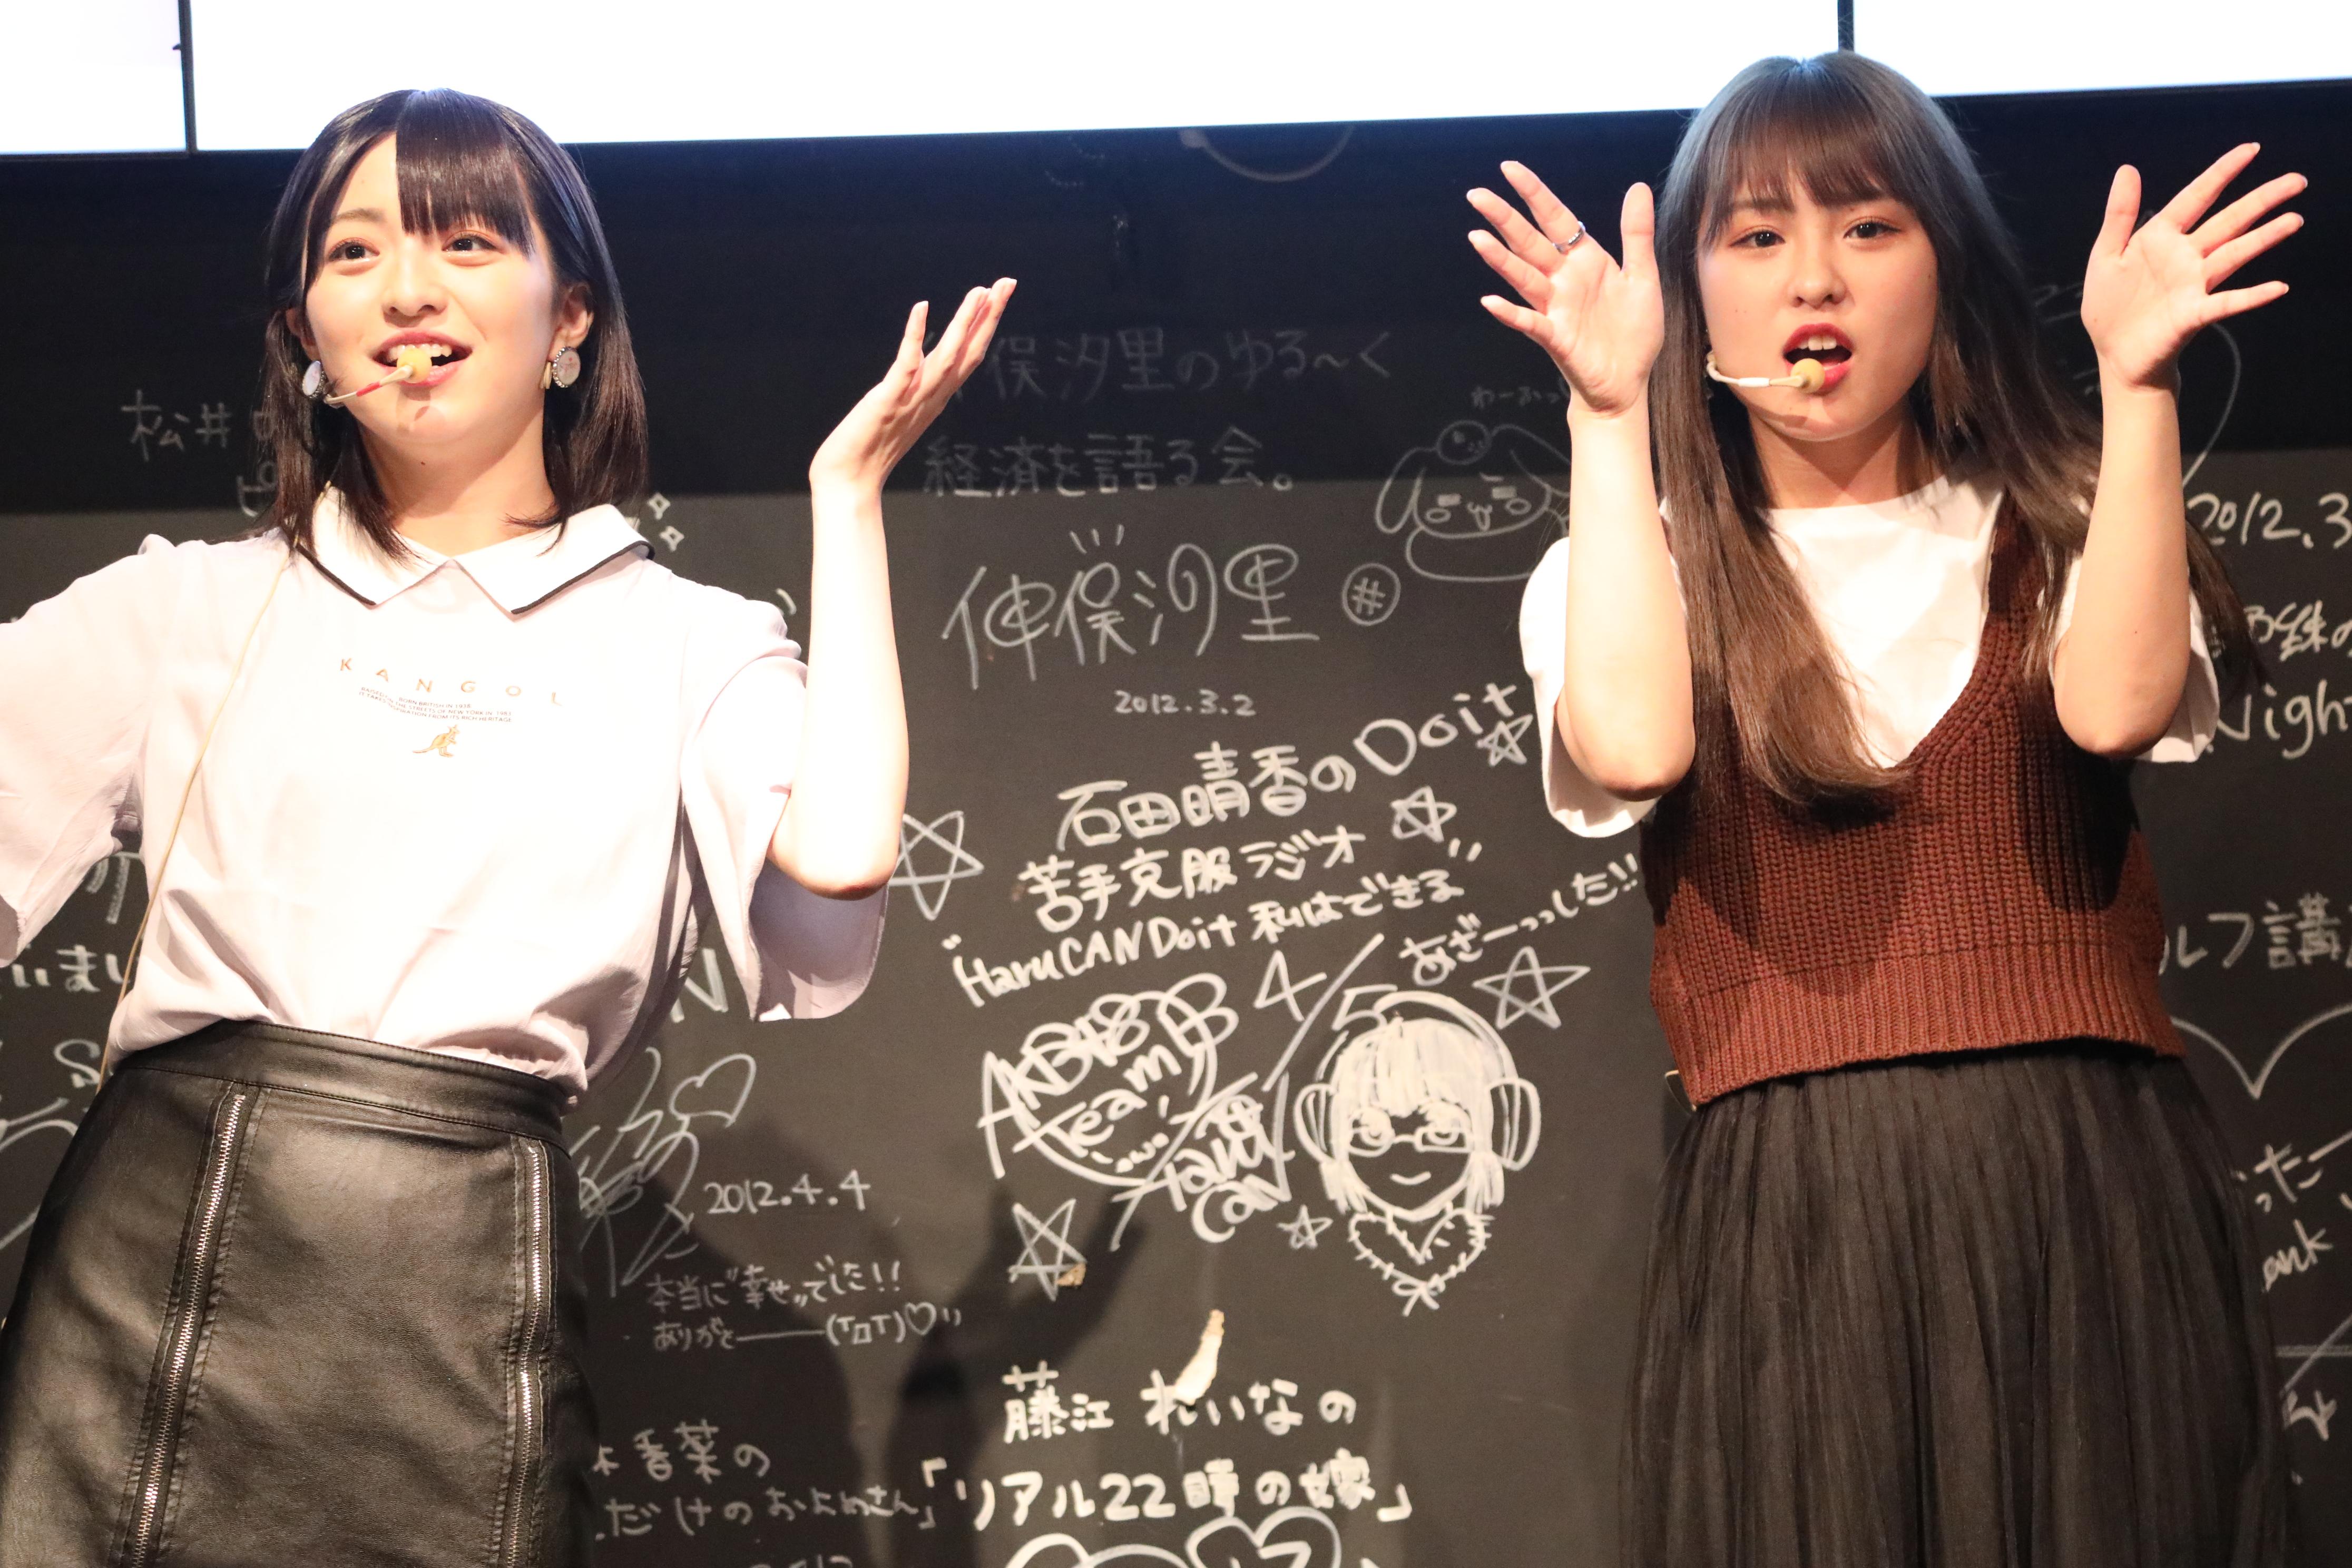 「Wななみ」(佐藤七海と山田菜々美)で『ハートの独占権』を披露